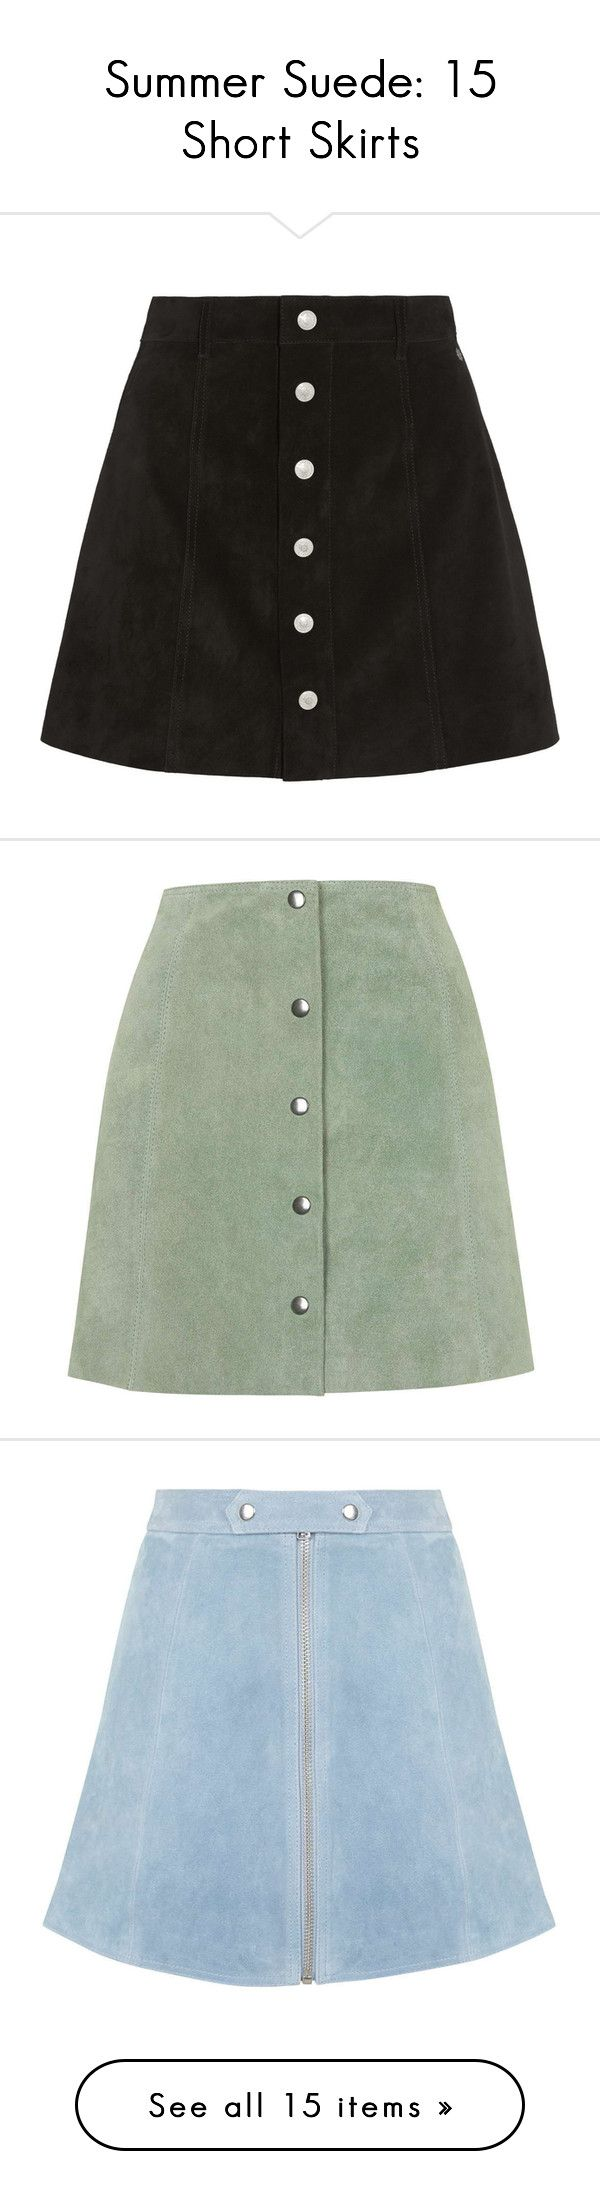 17 Best ideas about Black A Line Skirt on Pinterest | Sixth form ...